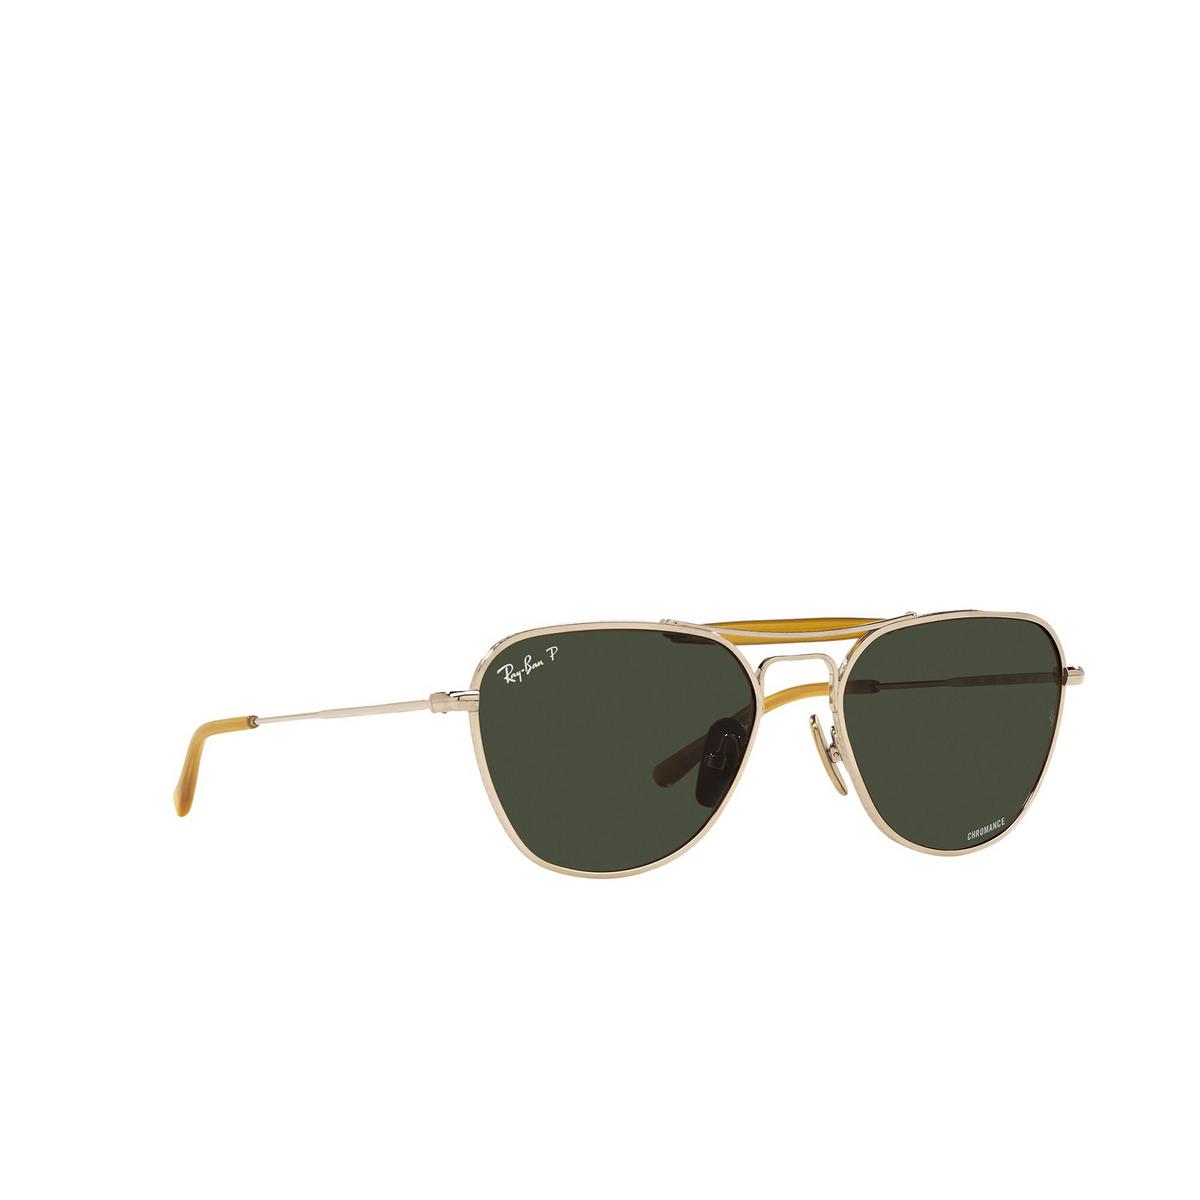 Ray-Ban® Irregular Sunglasses: RB8064 color Arista 9205P1 - three-quarters view.